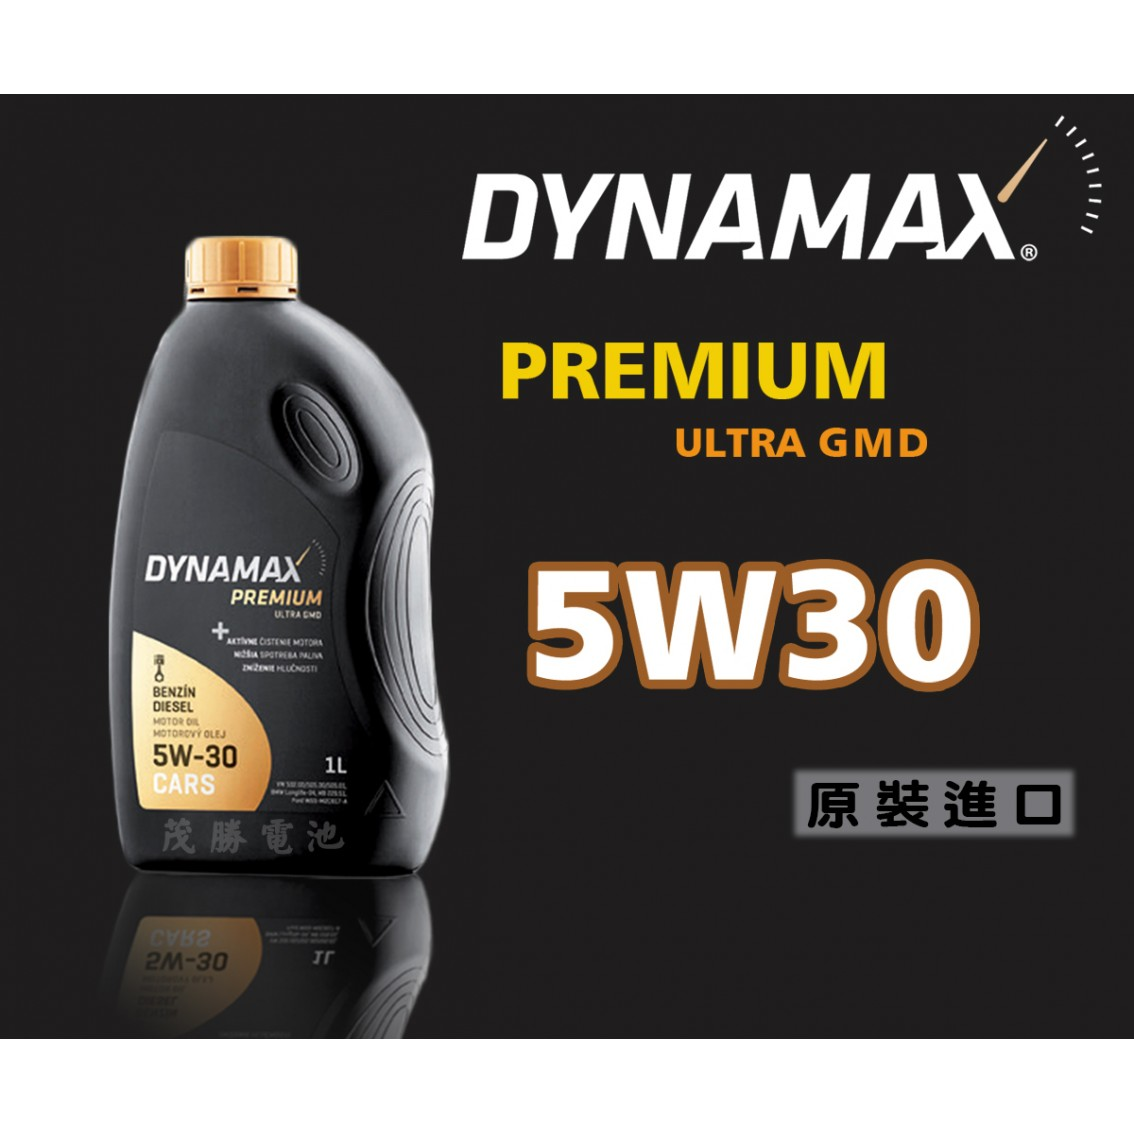 PREMIUM ULTRA GMD 5W30